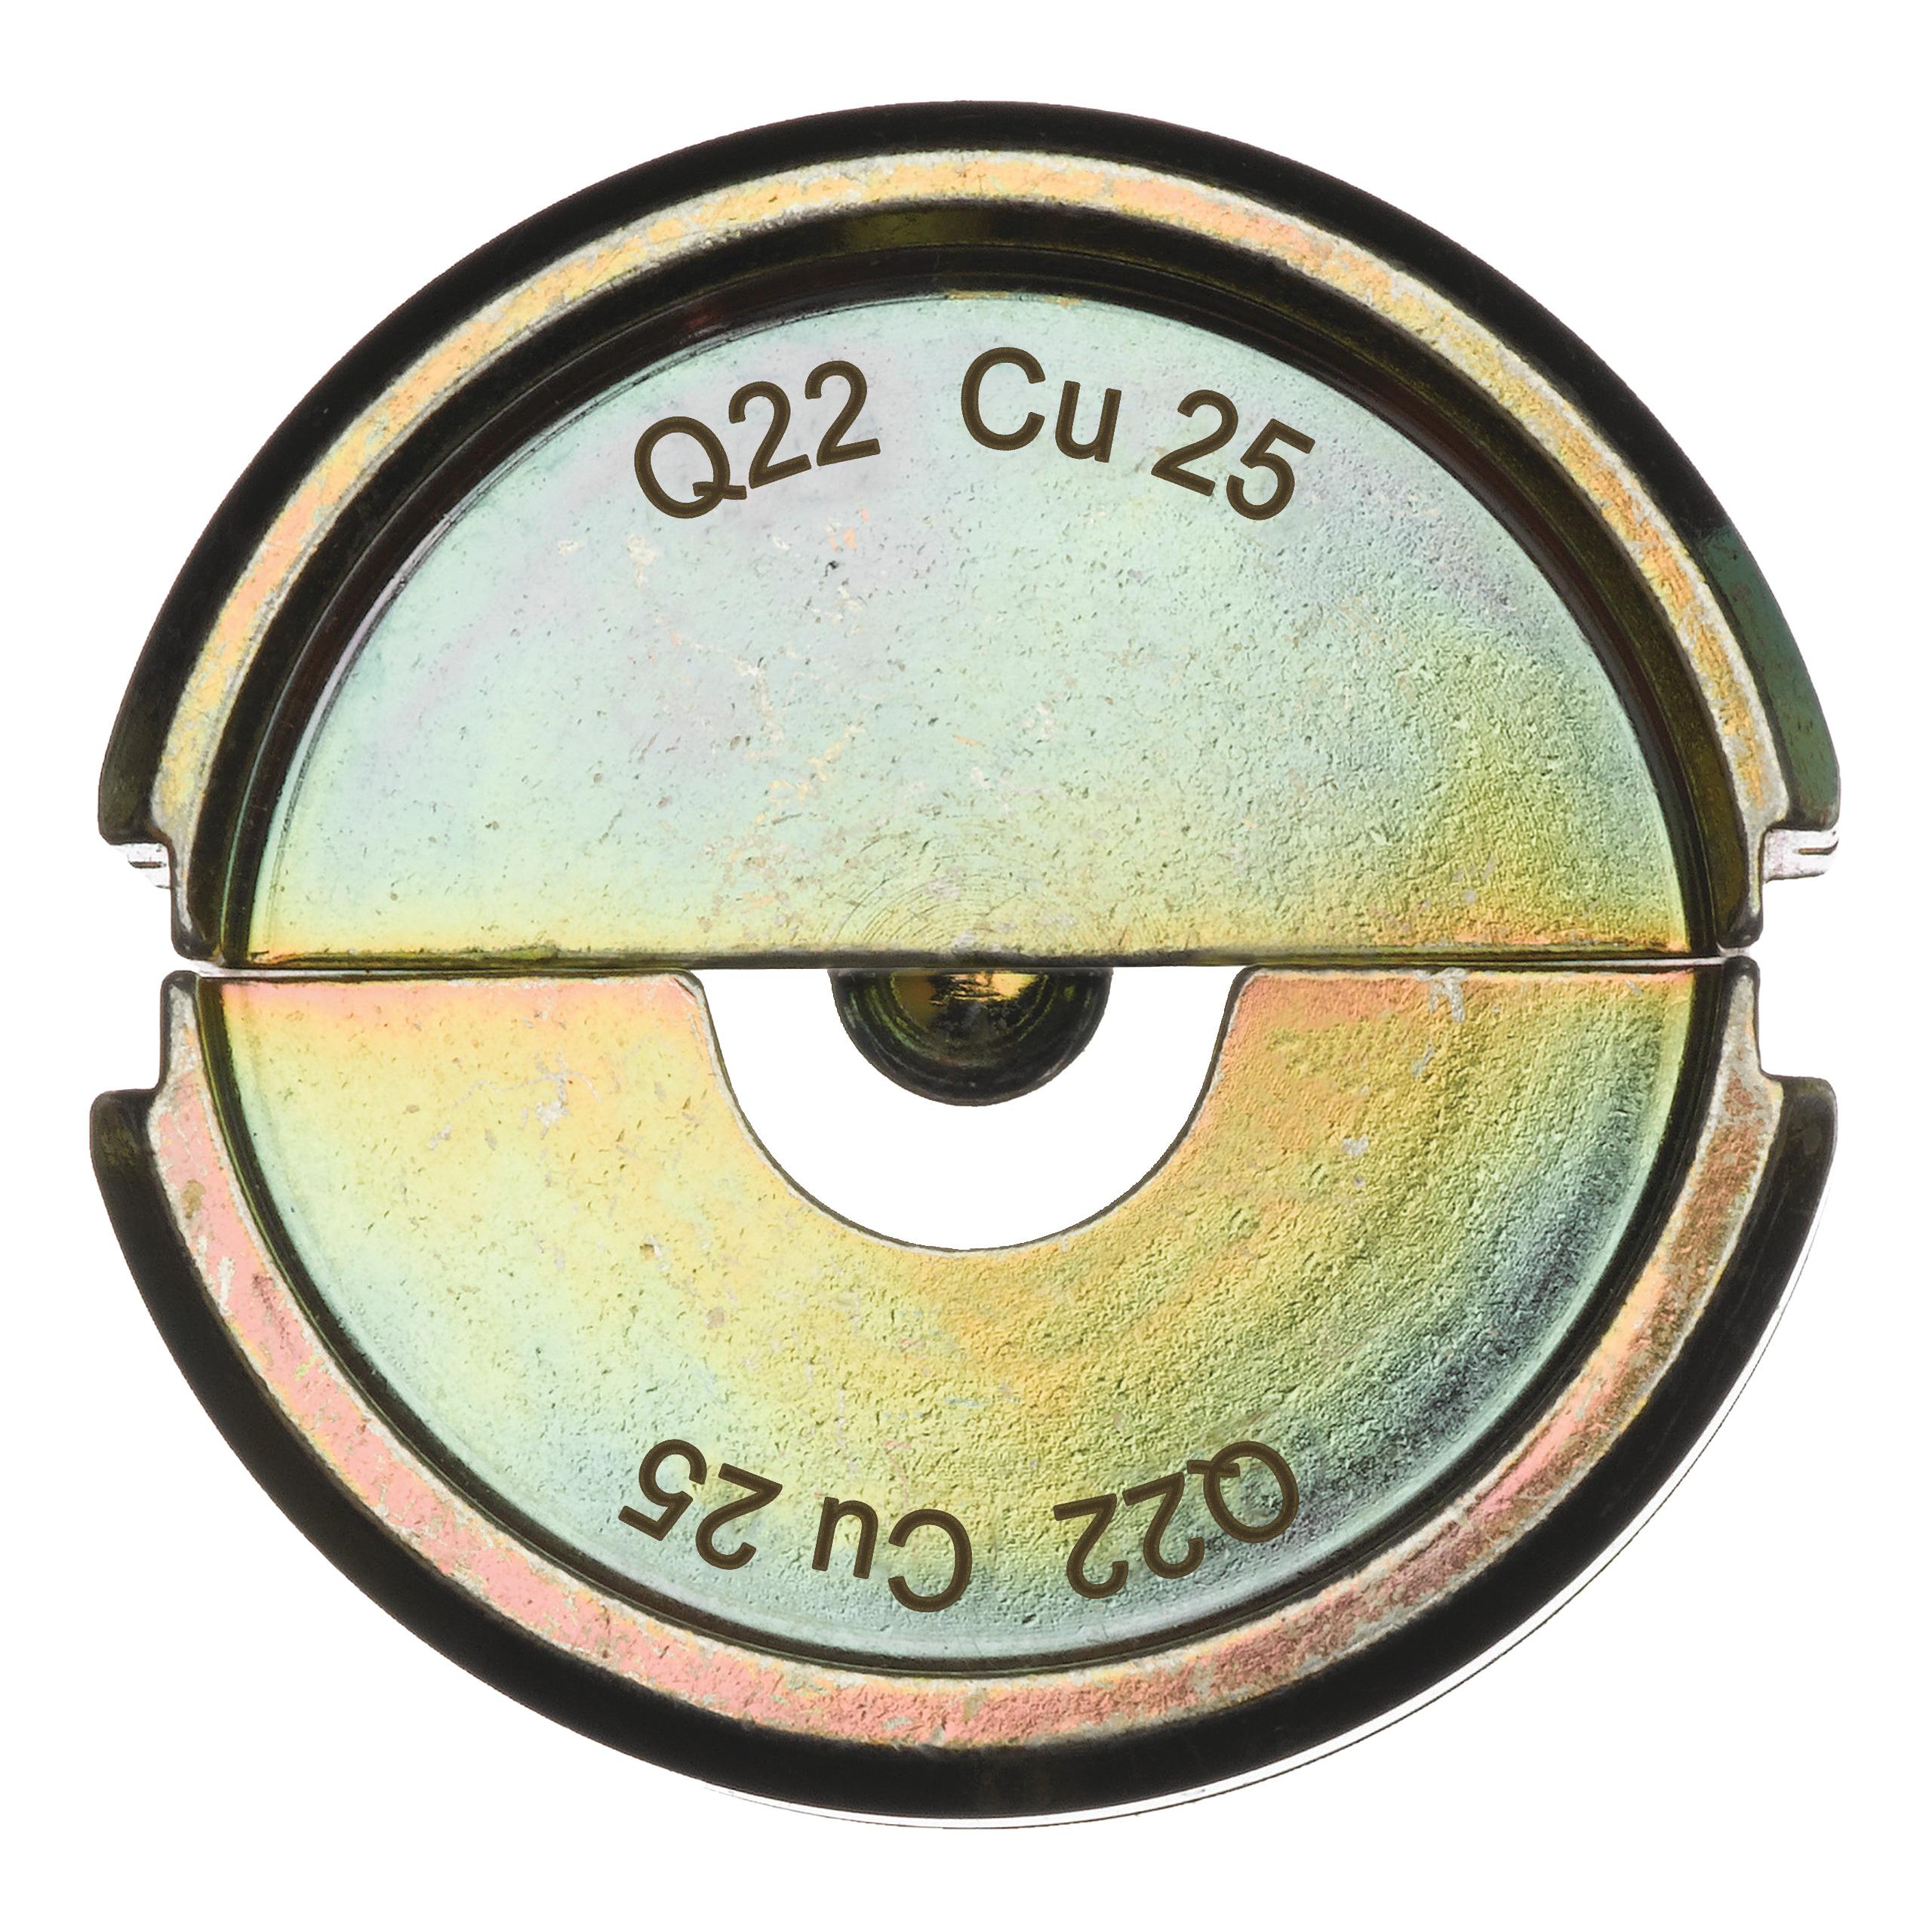 Krimpovací čelisti  Q22 CU 25